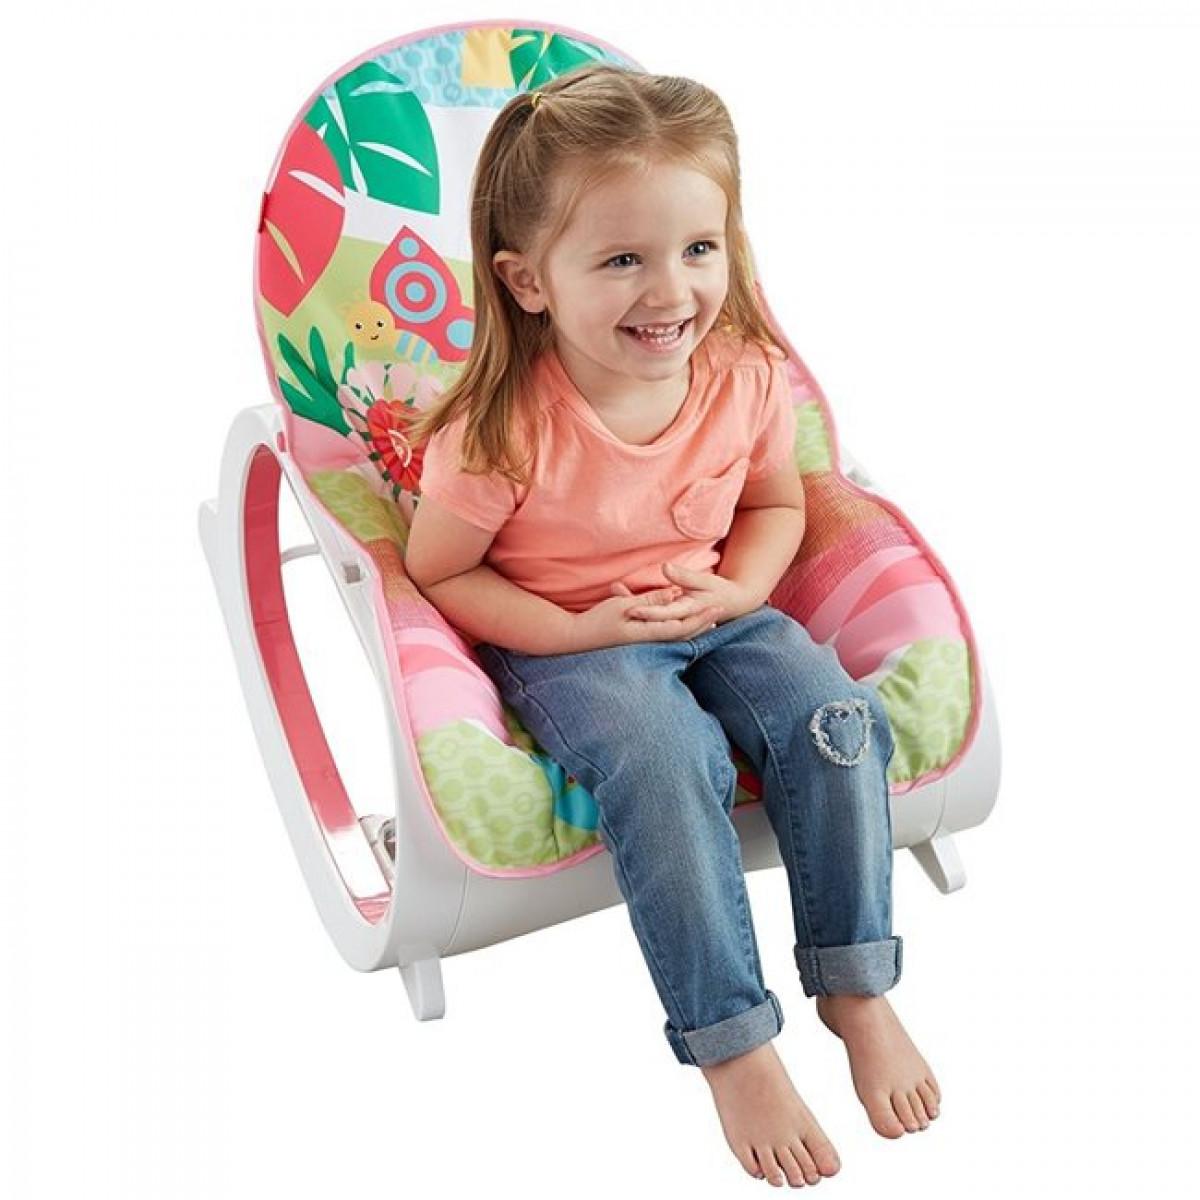 77ddfa95dbb ... Fisher Price Infant To Toddler-Ριλάξ/Κούνια Τιγράκι (FMN40)